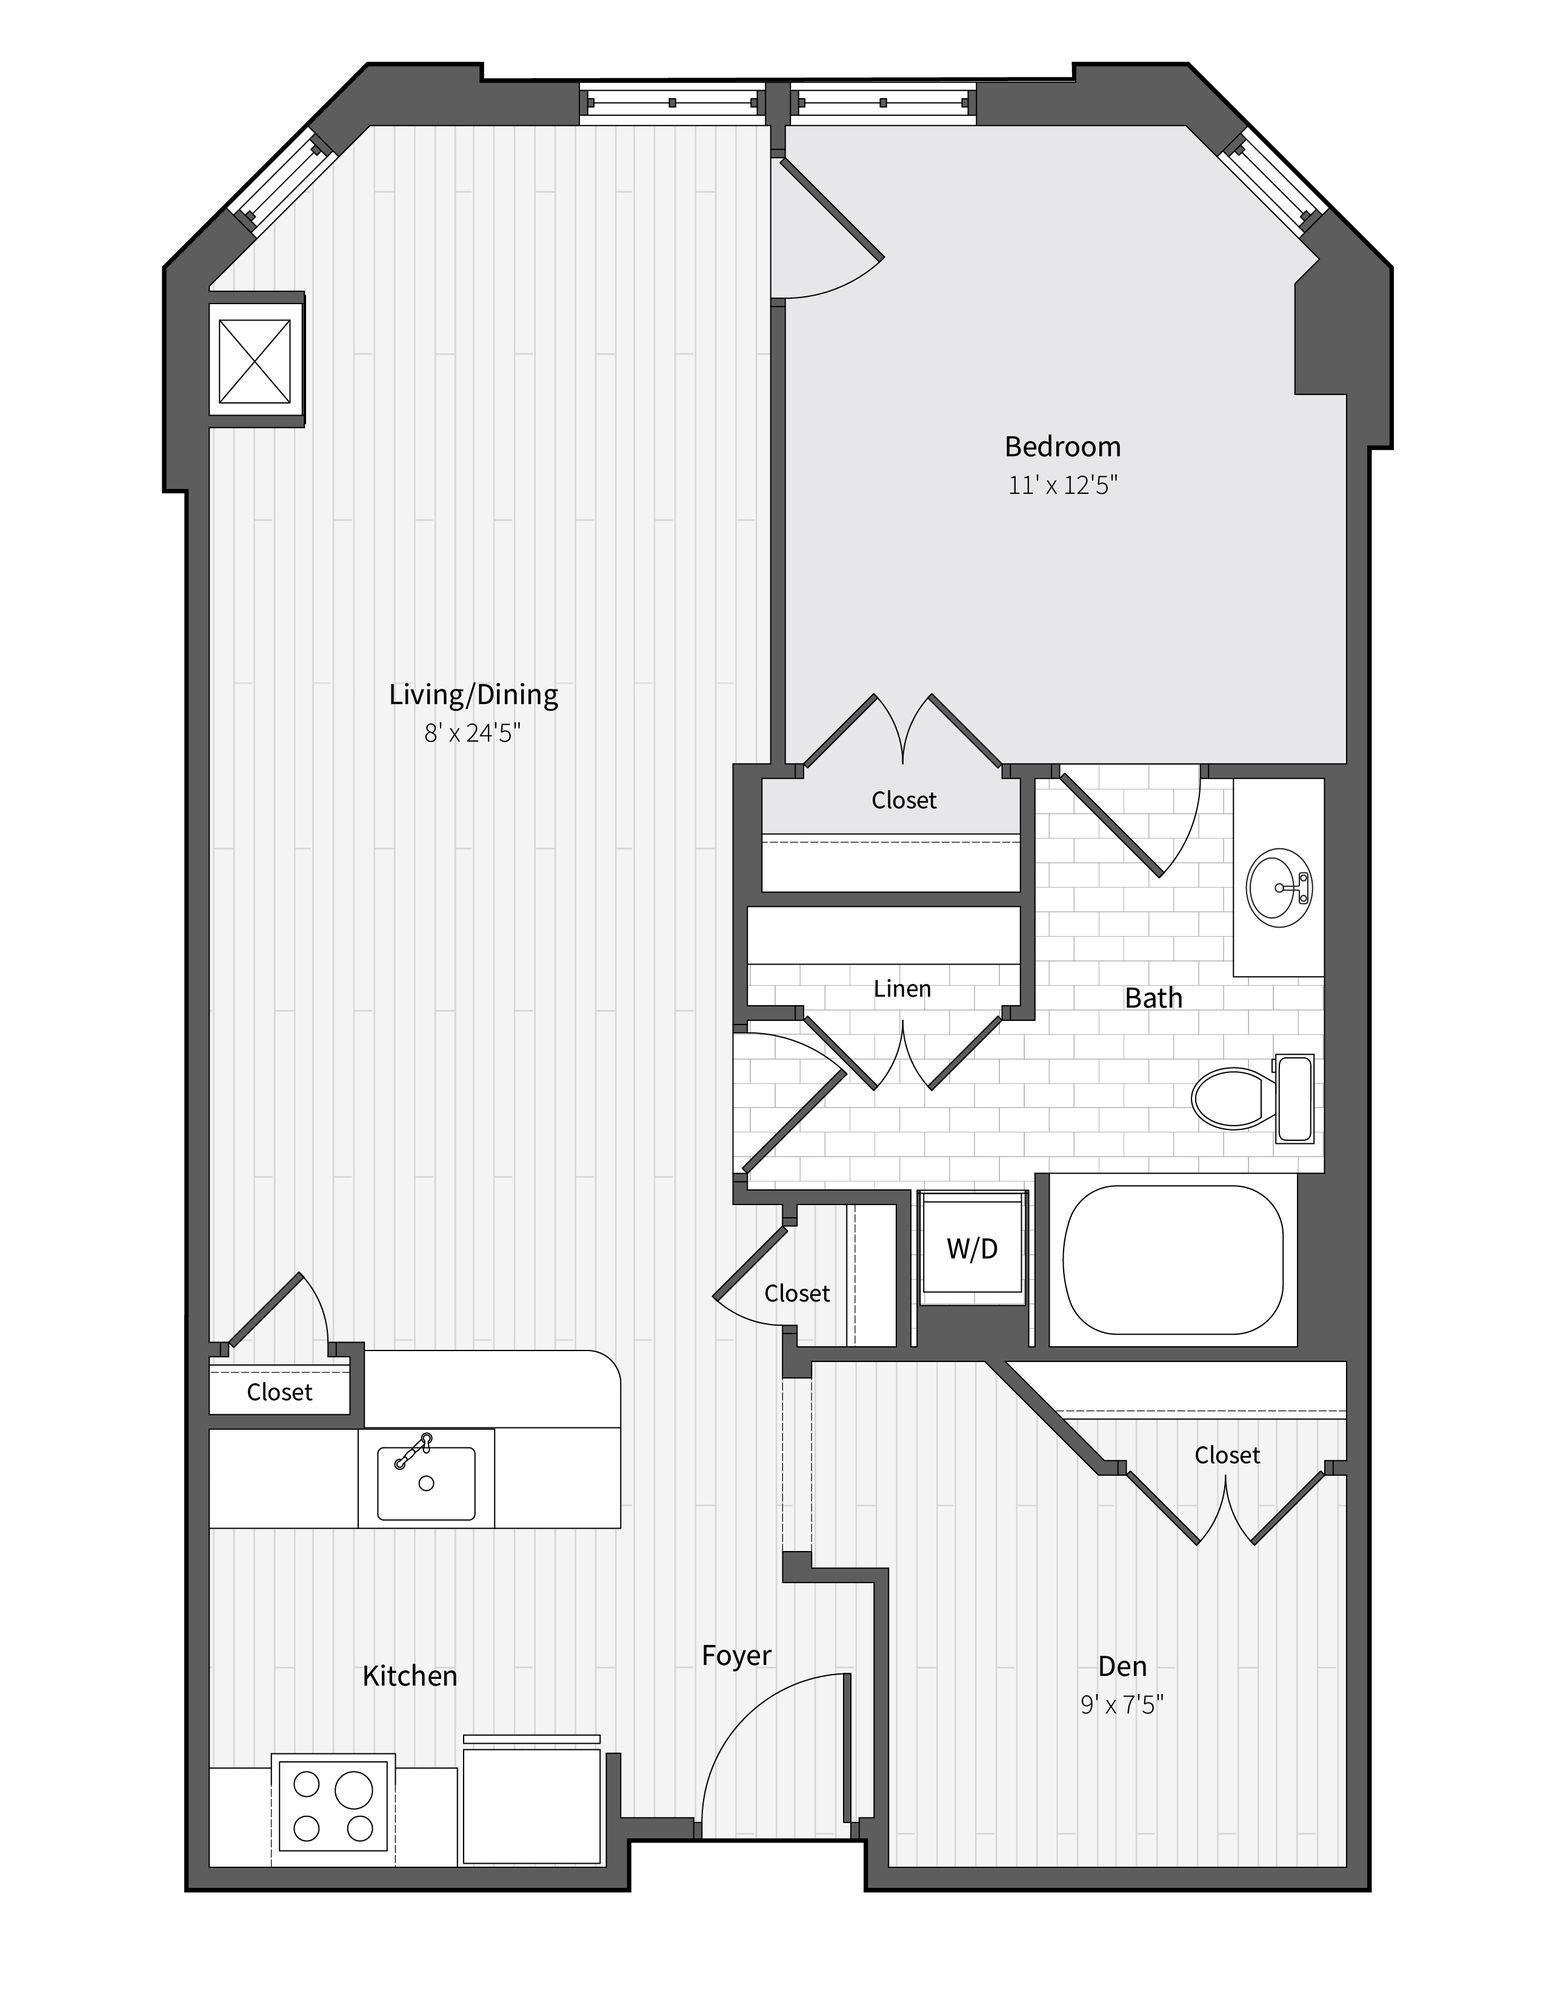 Apartment 321 floorplan